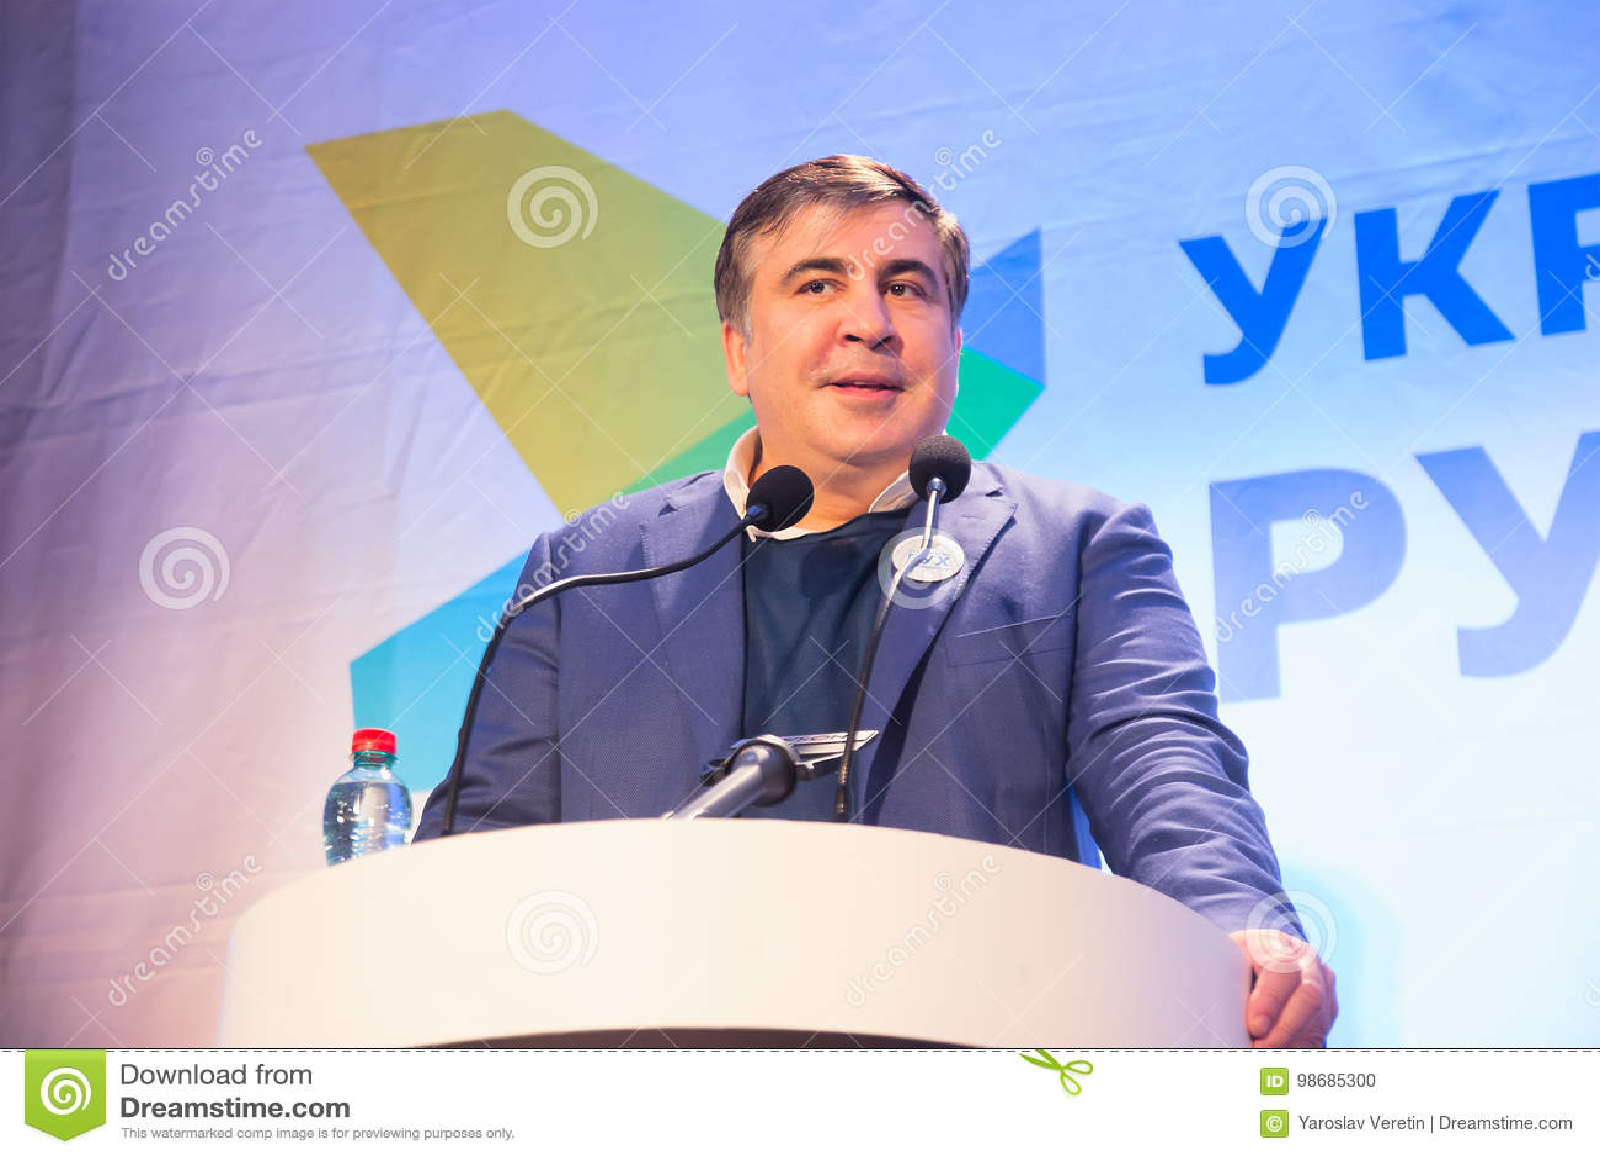 ZHYTOMYR, de OEKRAÏNE - 28 Februari, 2016: Mikheil Saakashvili bij anti-corruptieforum